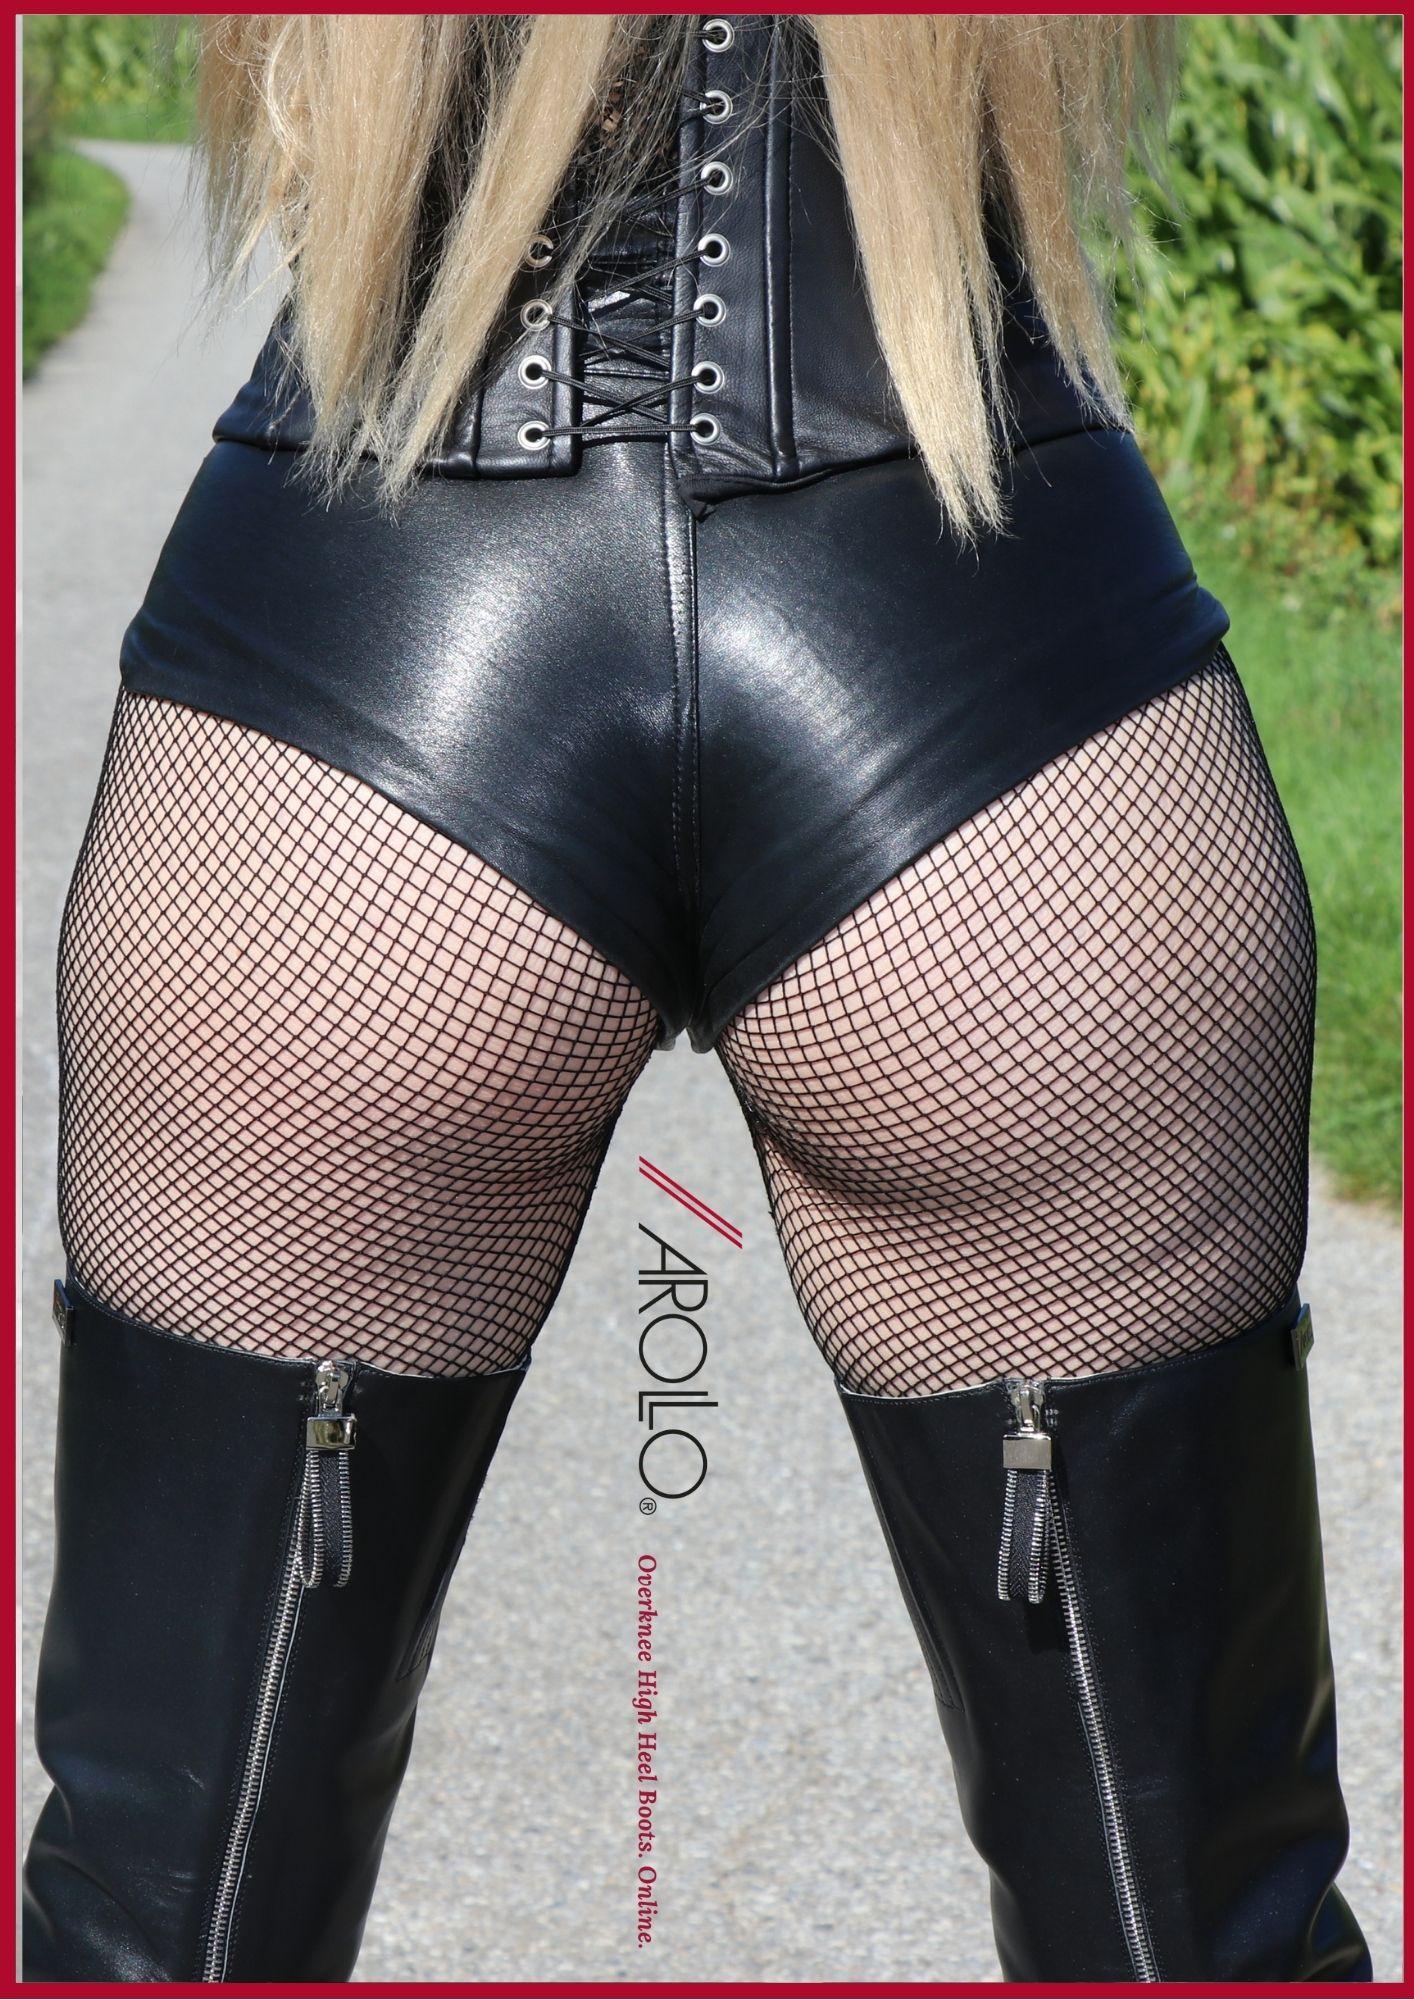 Full length zipper boots by AROLLO